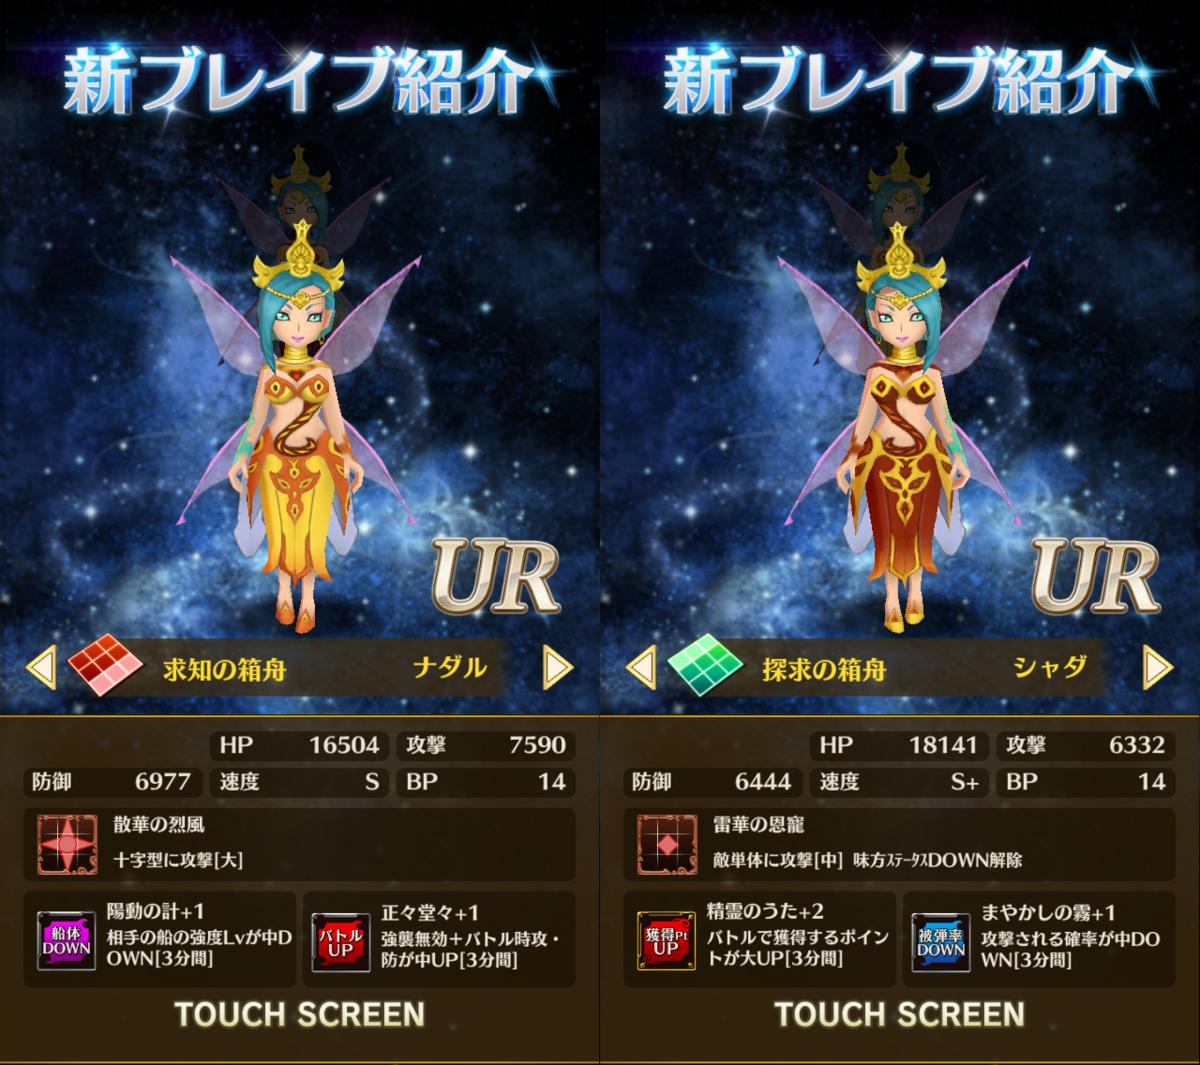 f:id:saki_yukino:20190426170839p:plain